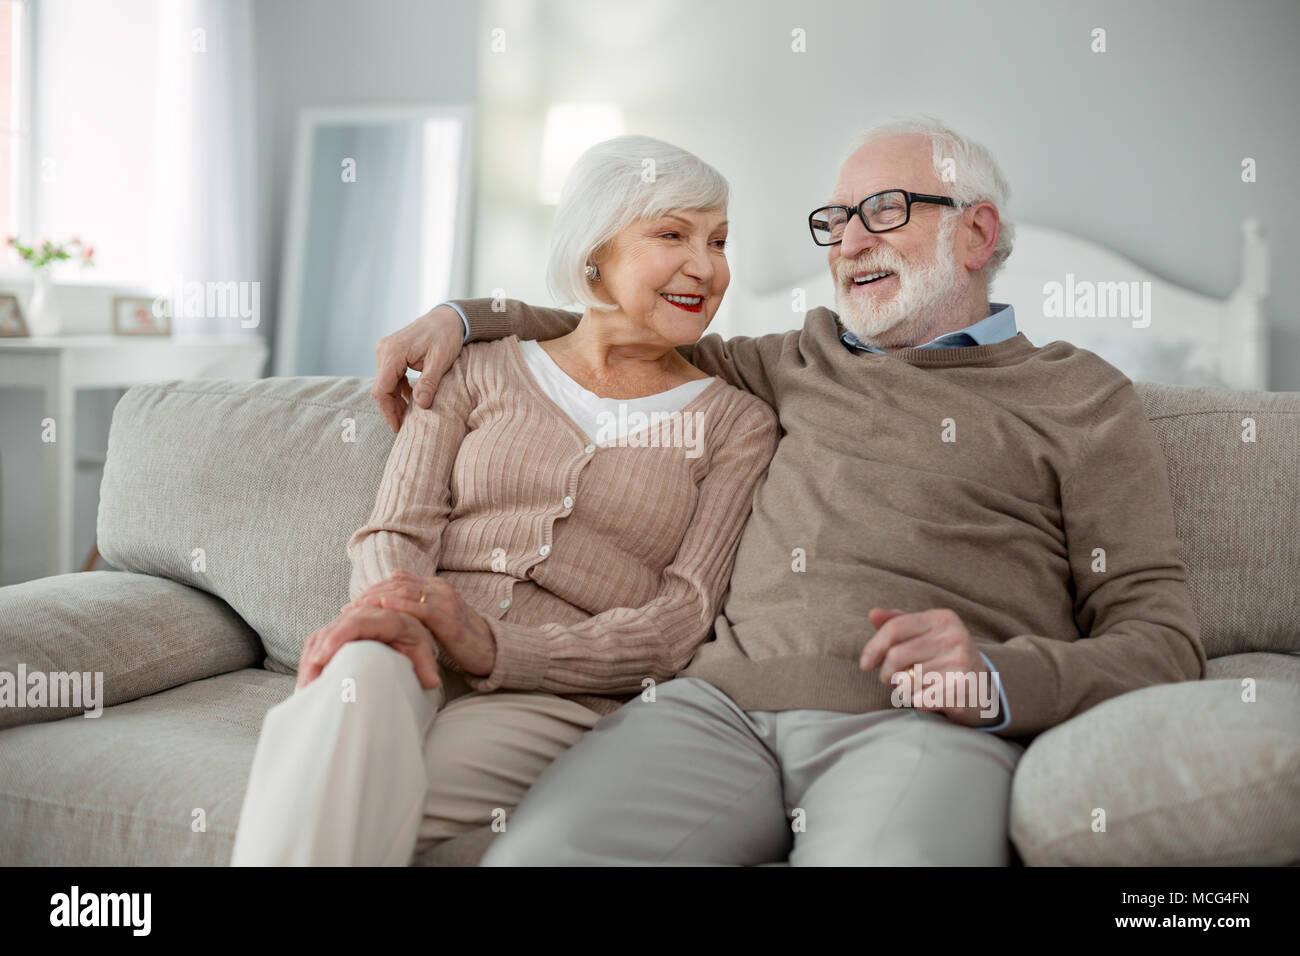 Joyful aged man hugging his wife - Stock Image